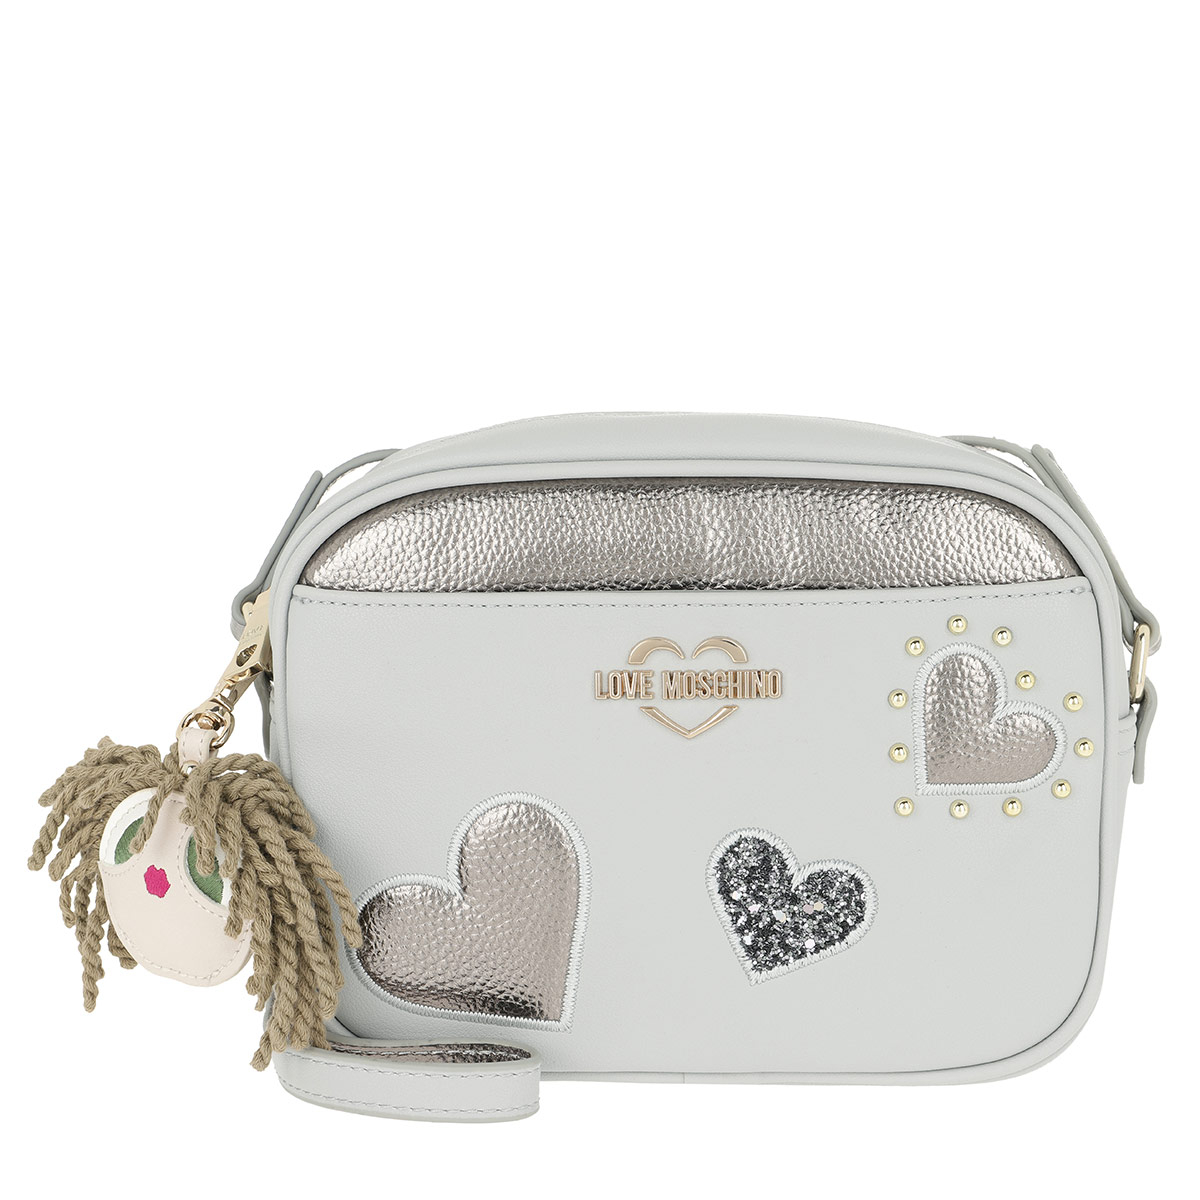 Love Moschino Umhängetasche - Charming Dolls Crossbody Bag Grey - in grau - für Damen